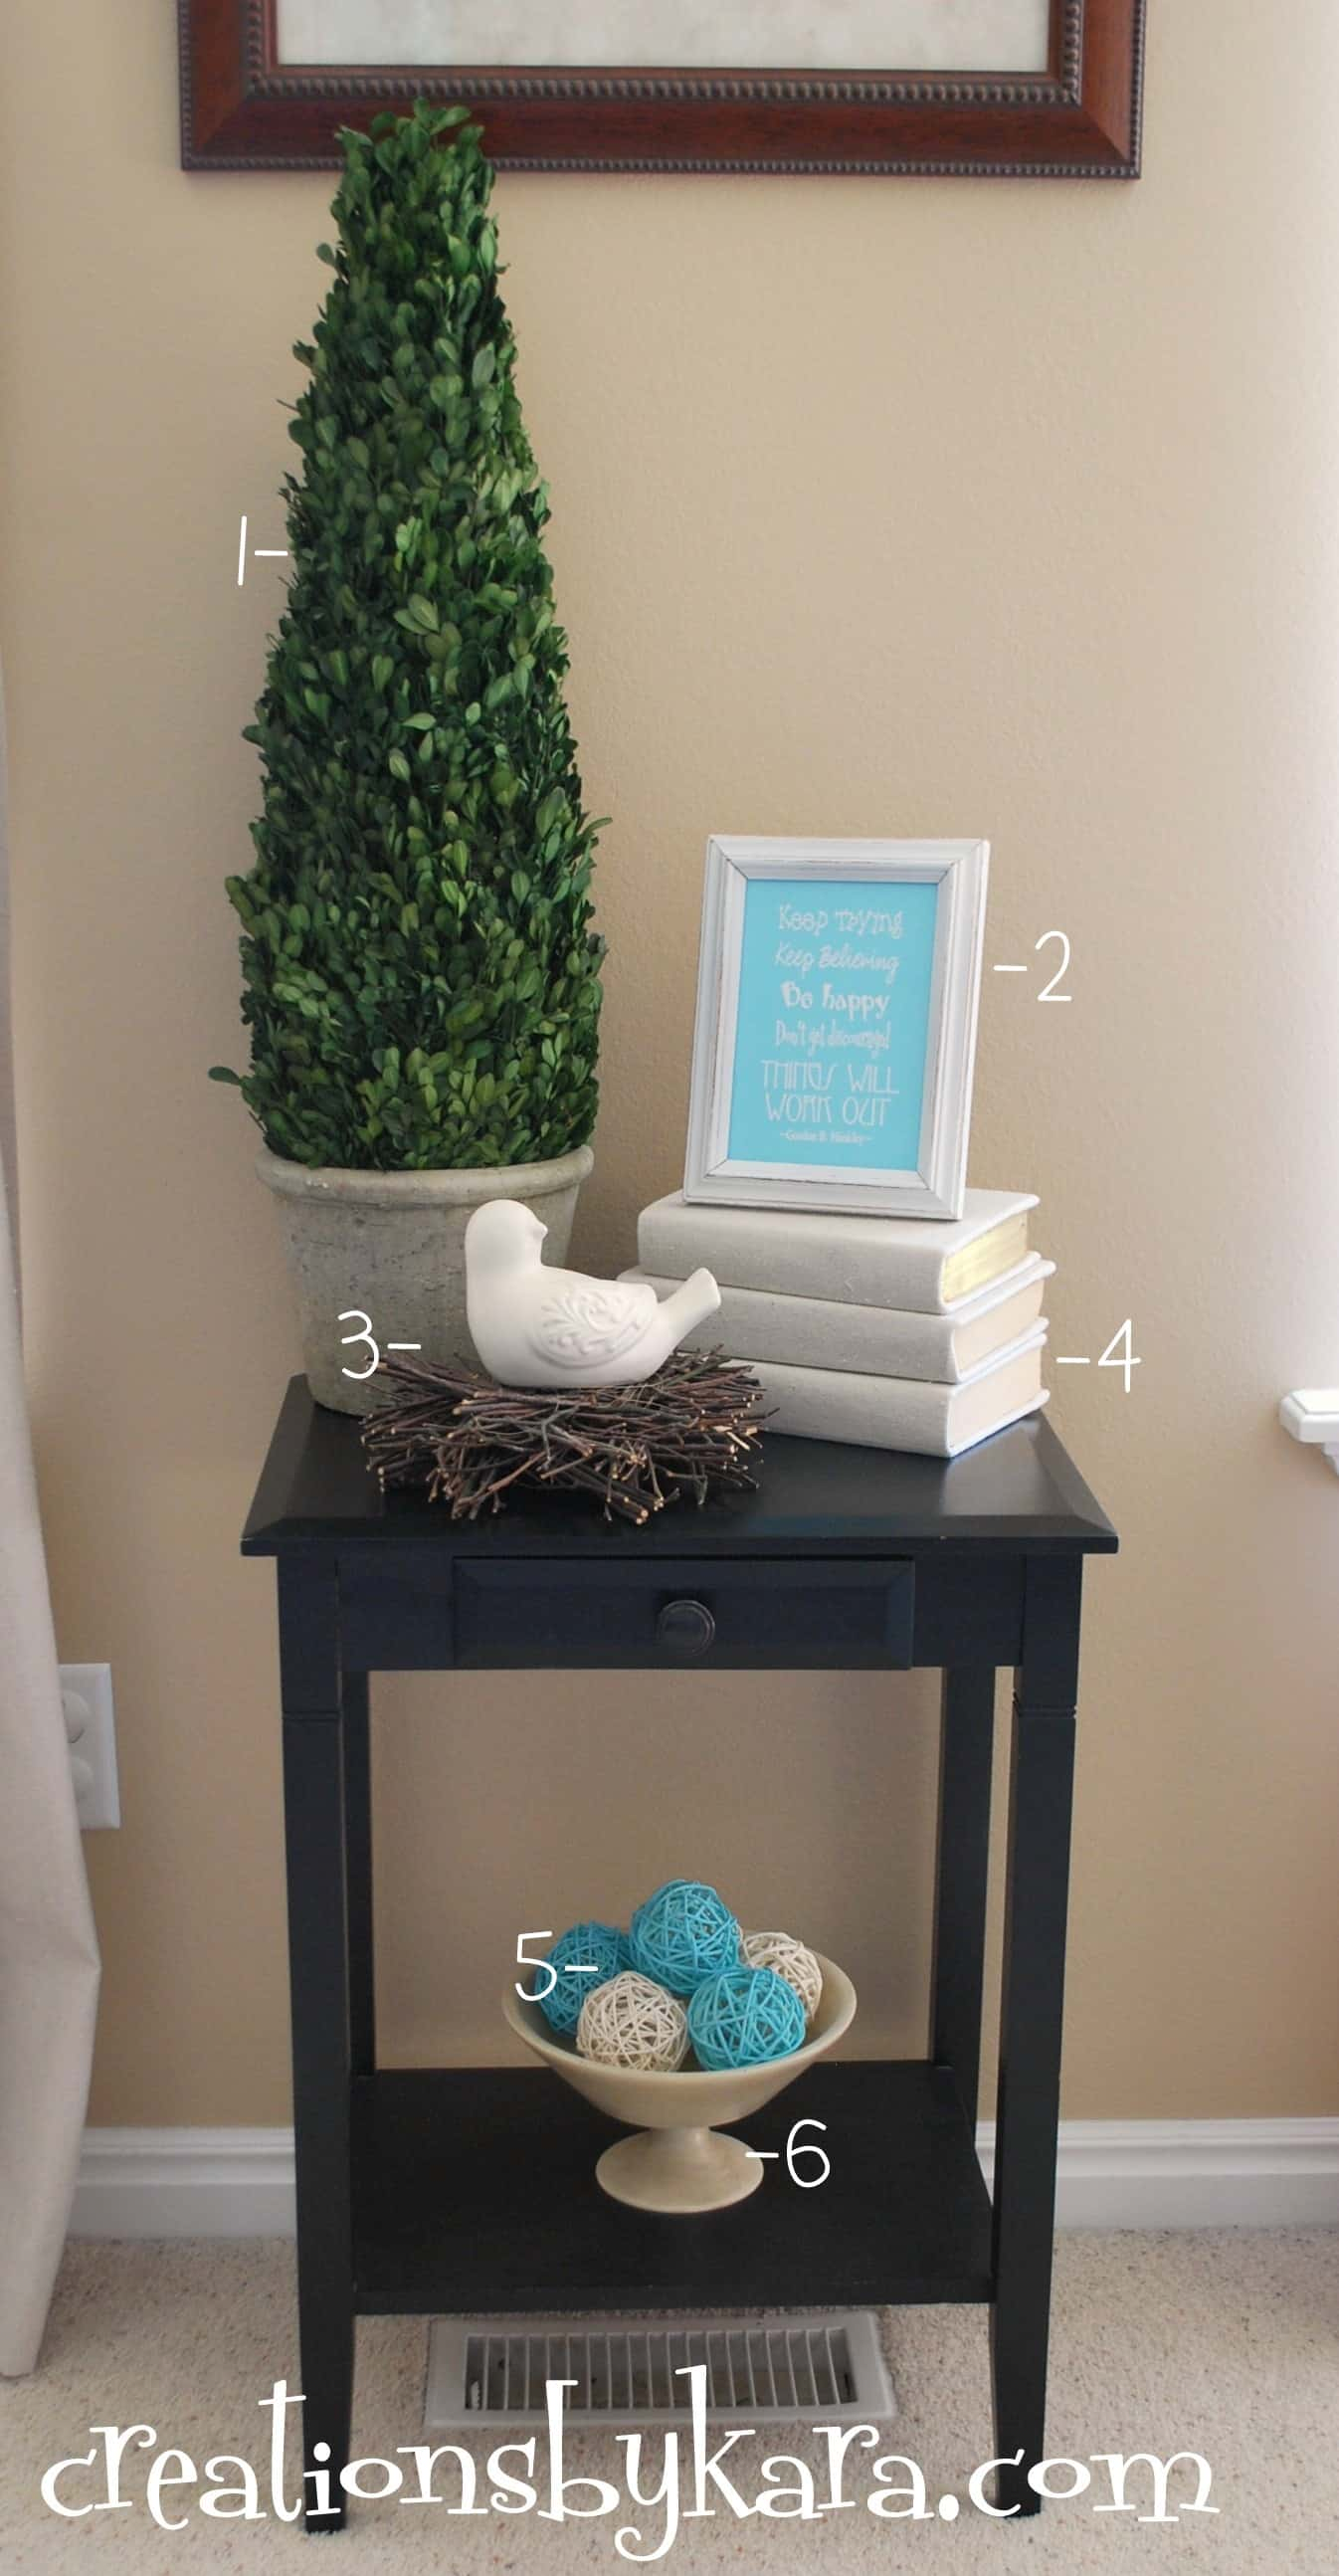 DIY Decorating Living Room Table Creations By Kara